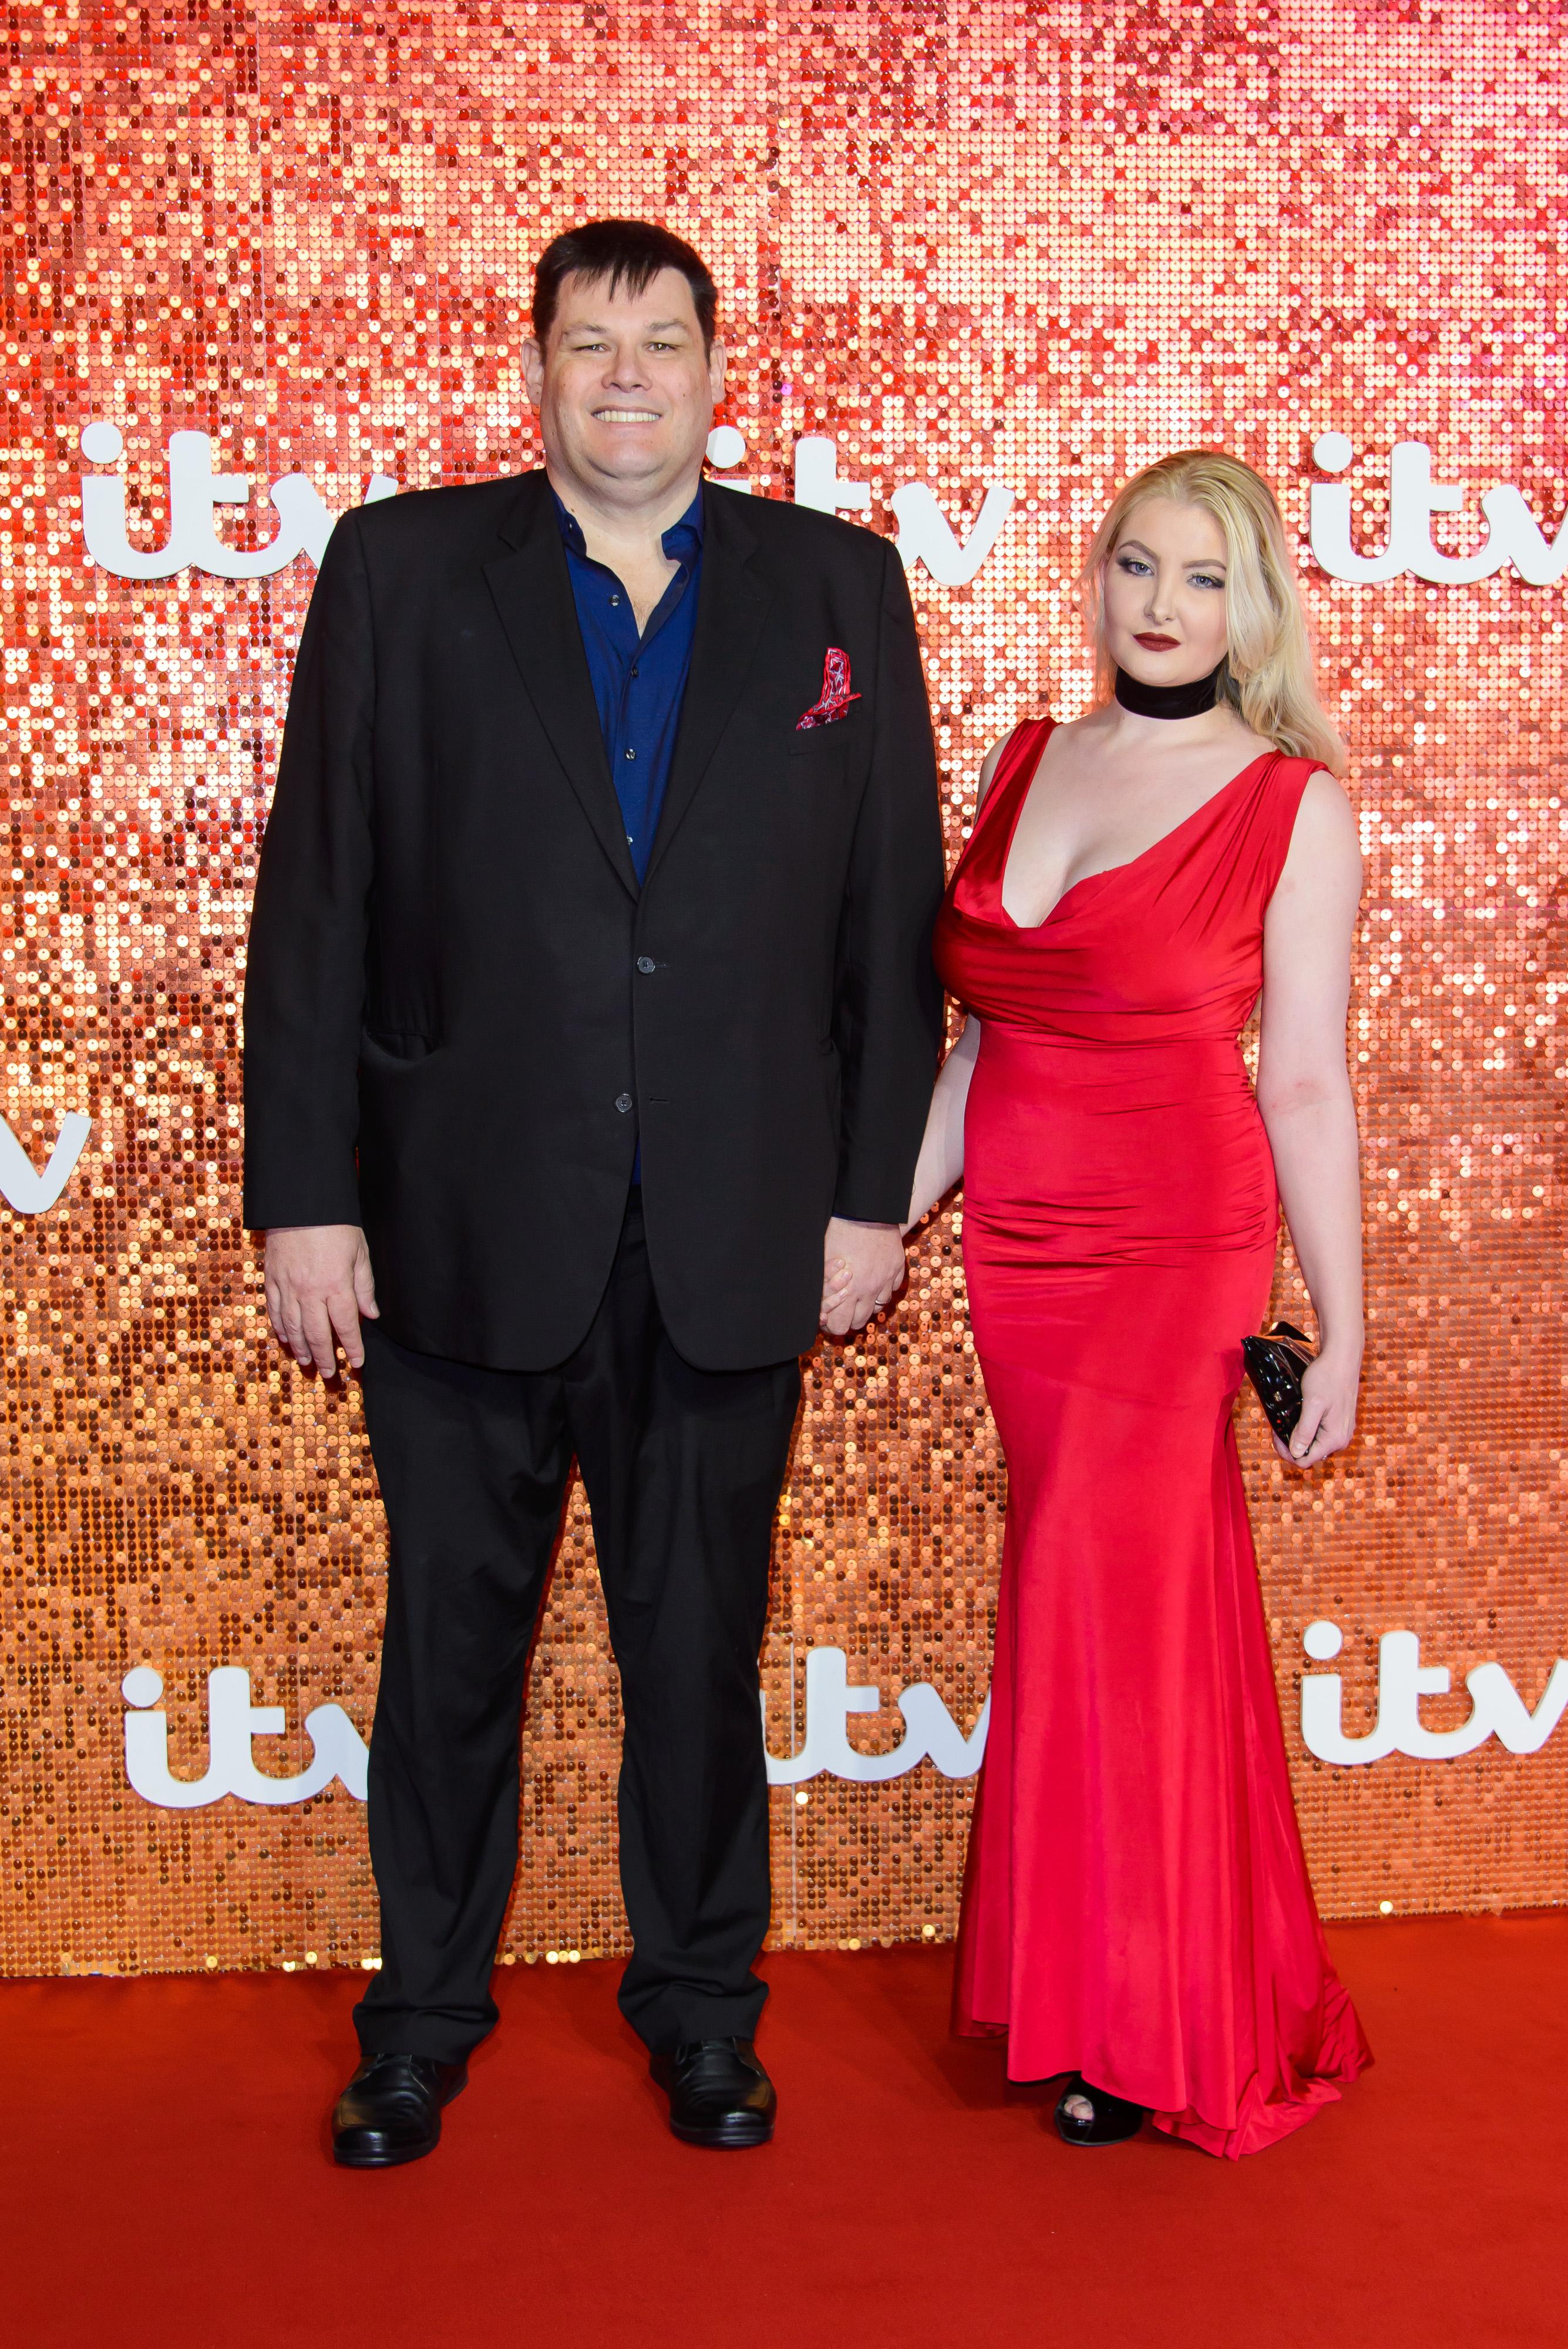 Mark Labbett and Katie Labbett arriving at the ITV Gala held at the London Palladium on November 9, 2017 in London, England. (Photo by Joe Maher/FilmMagic)